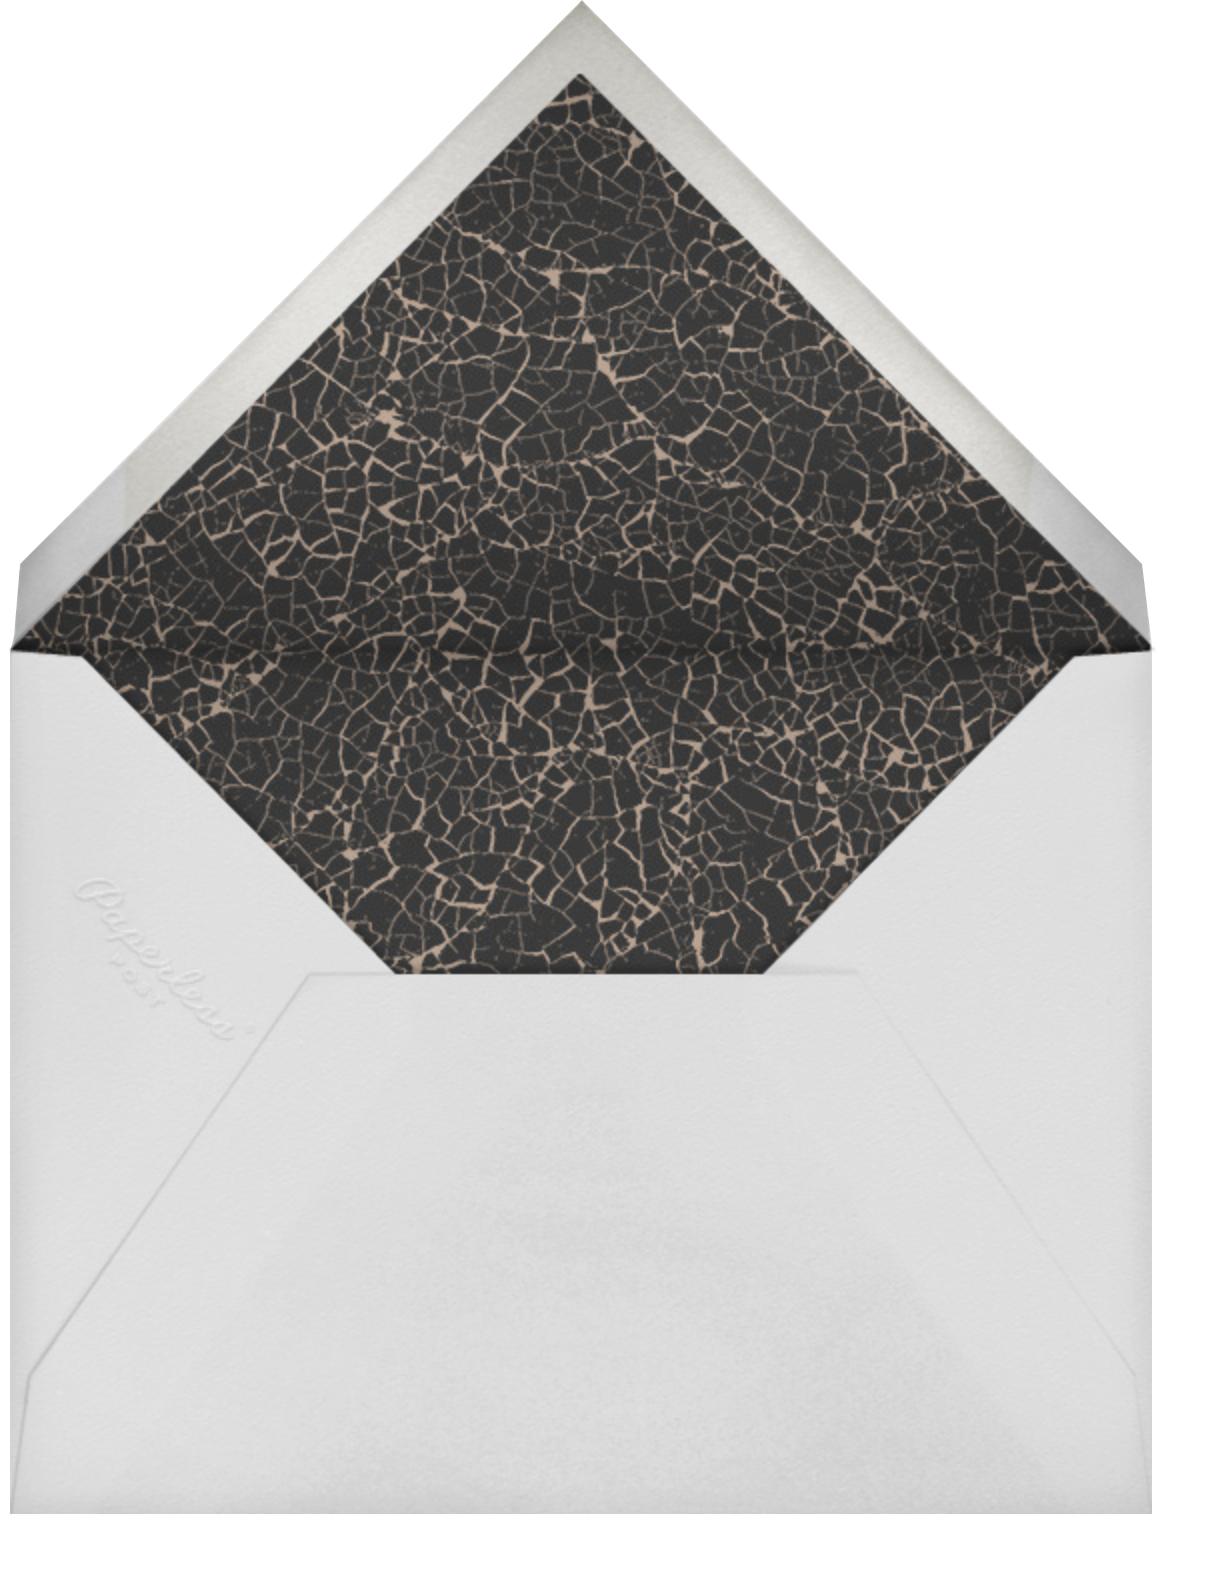 Woodcut - Walnut - Kelly Wearstler - Holiday party - envelope back